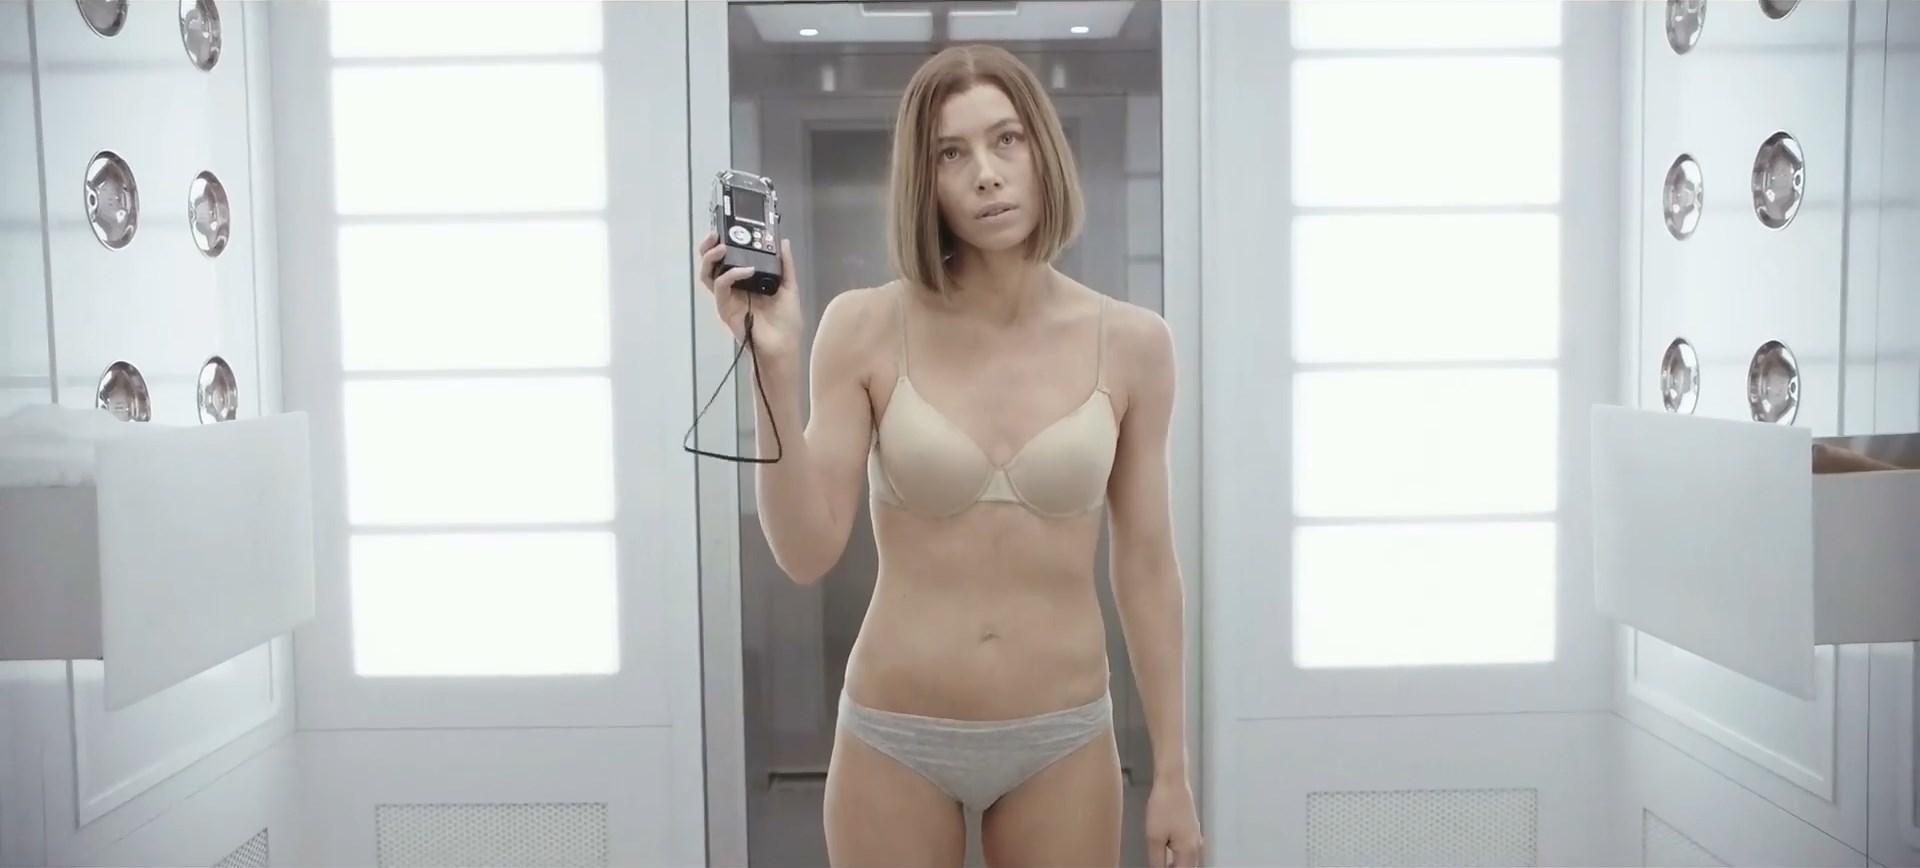 Jessica Biel Naked Video photo 1